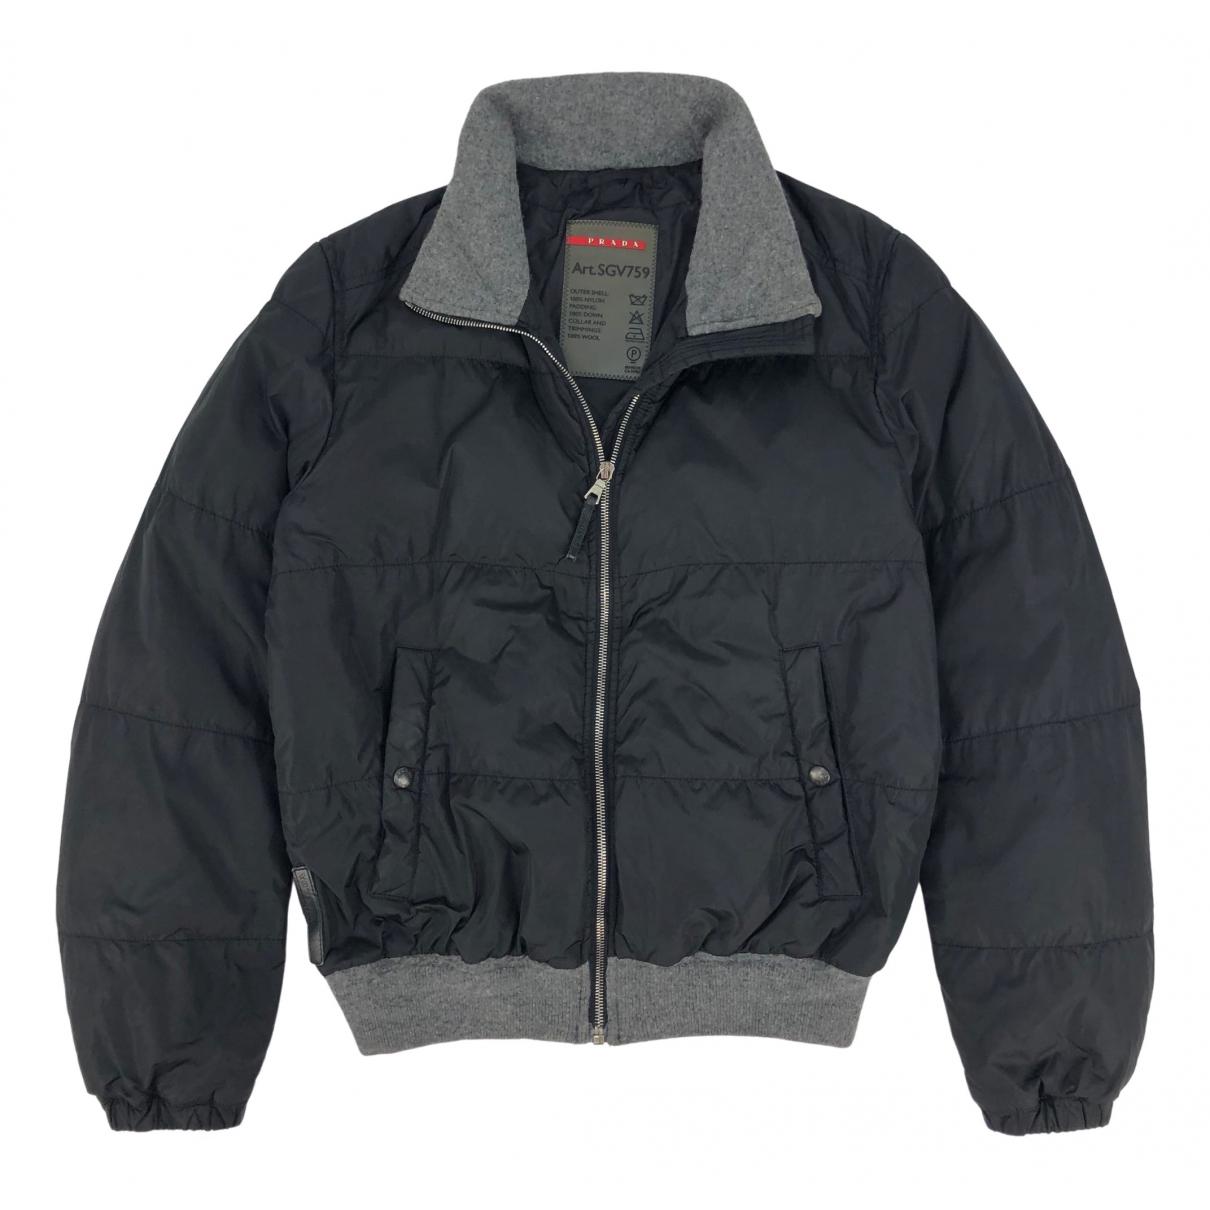 Prada \N Black jacket  for Men M International